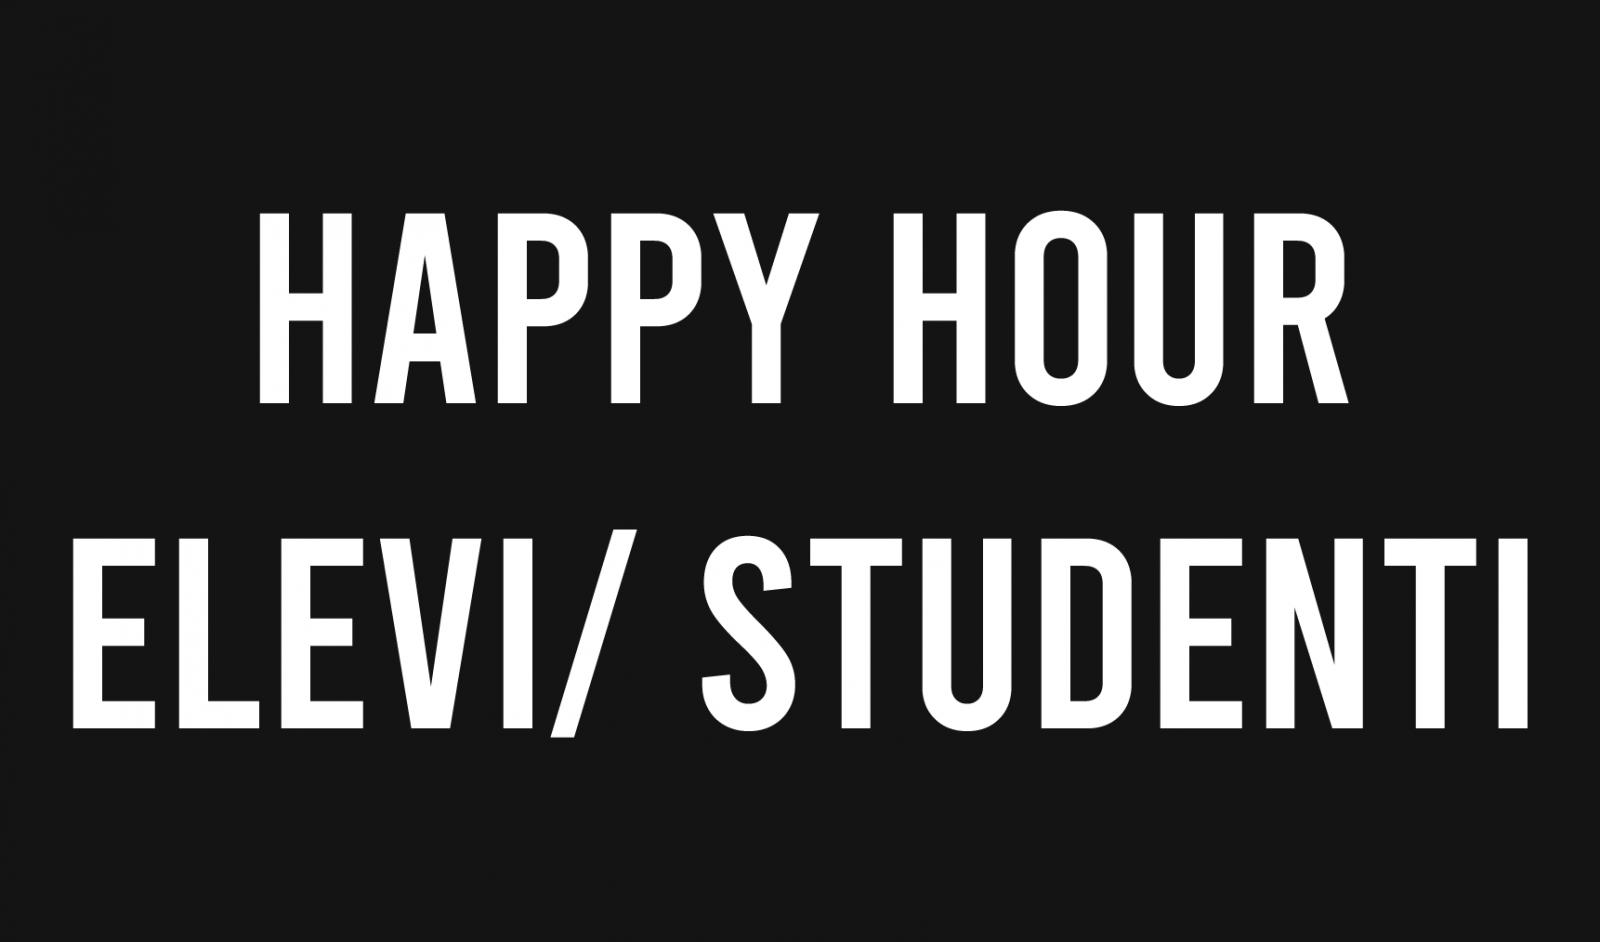 Happy hour Fitness pentru Elevi si Studenti